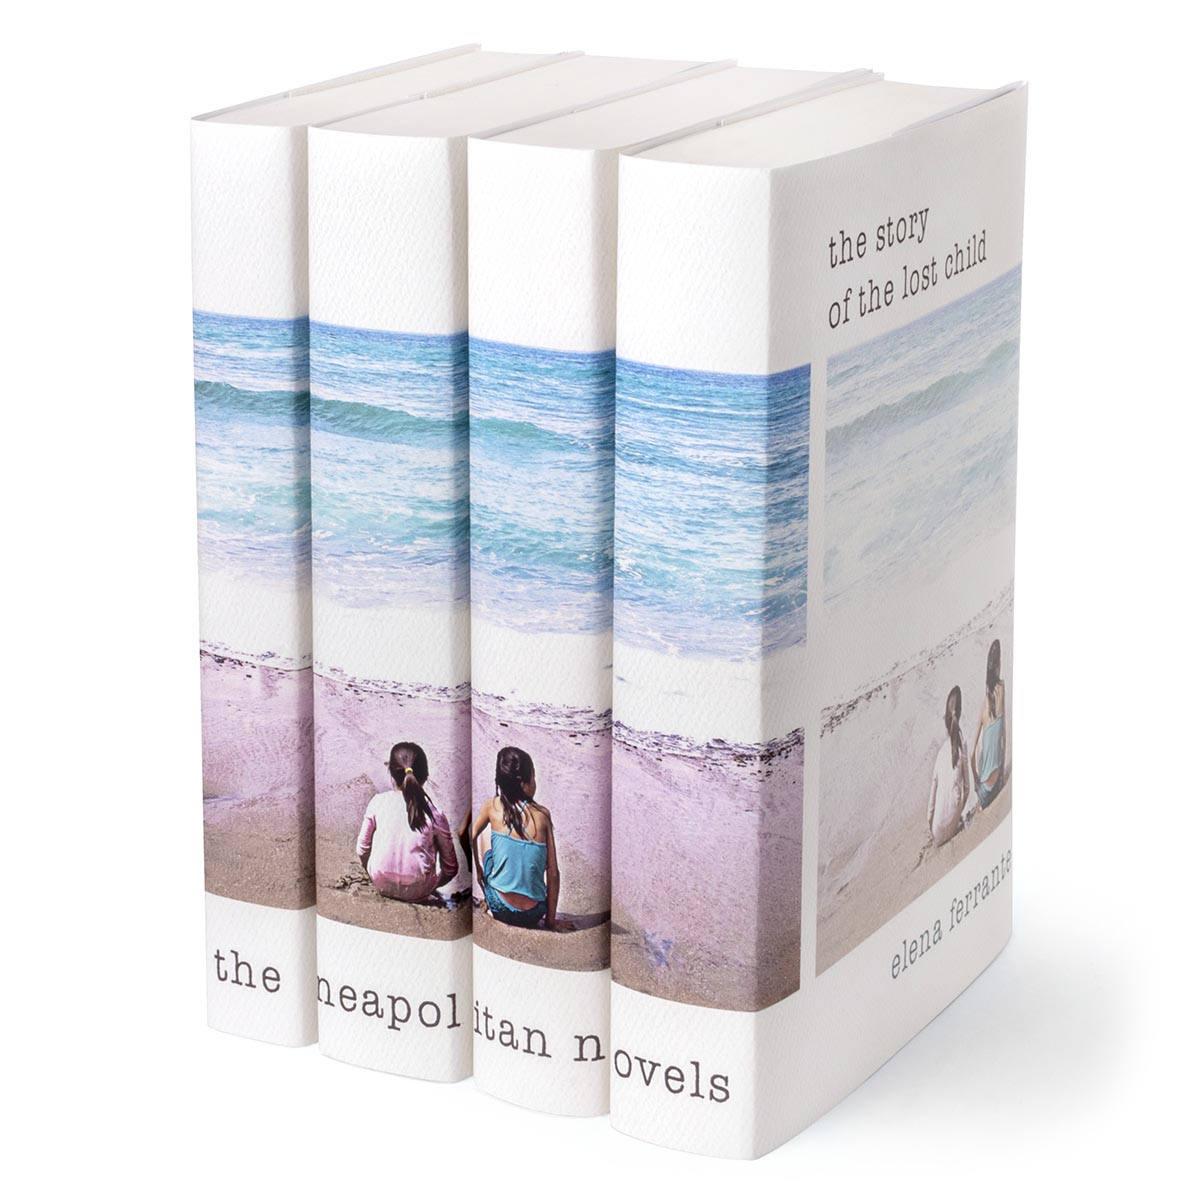 EENN4-the-neapolitan-novels-2-12001